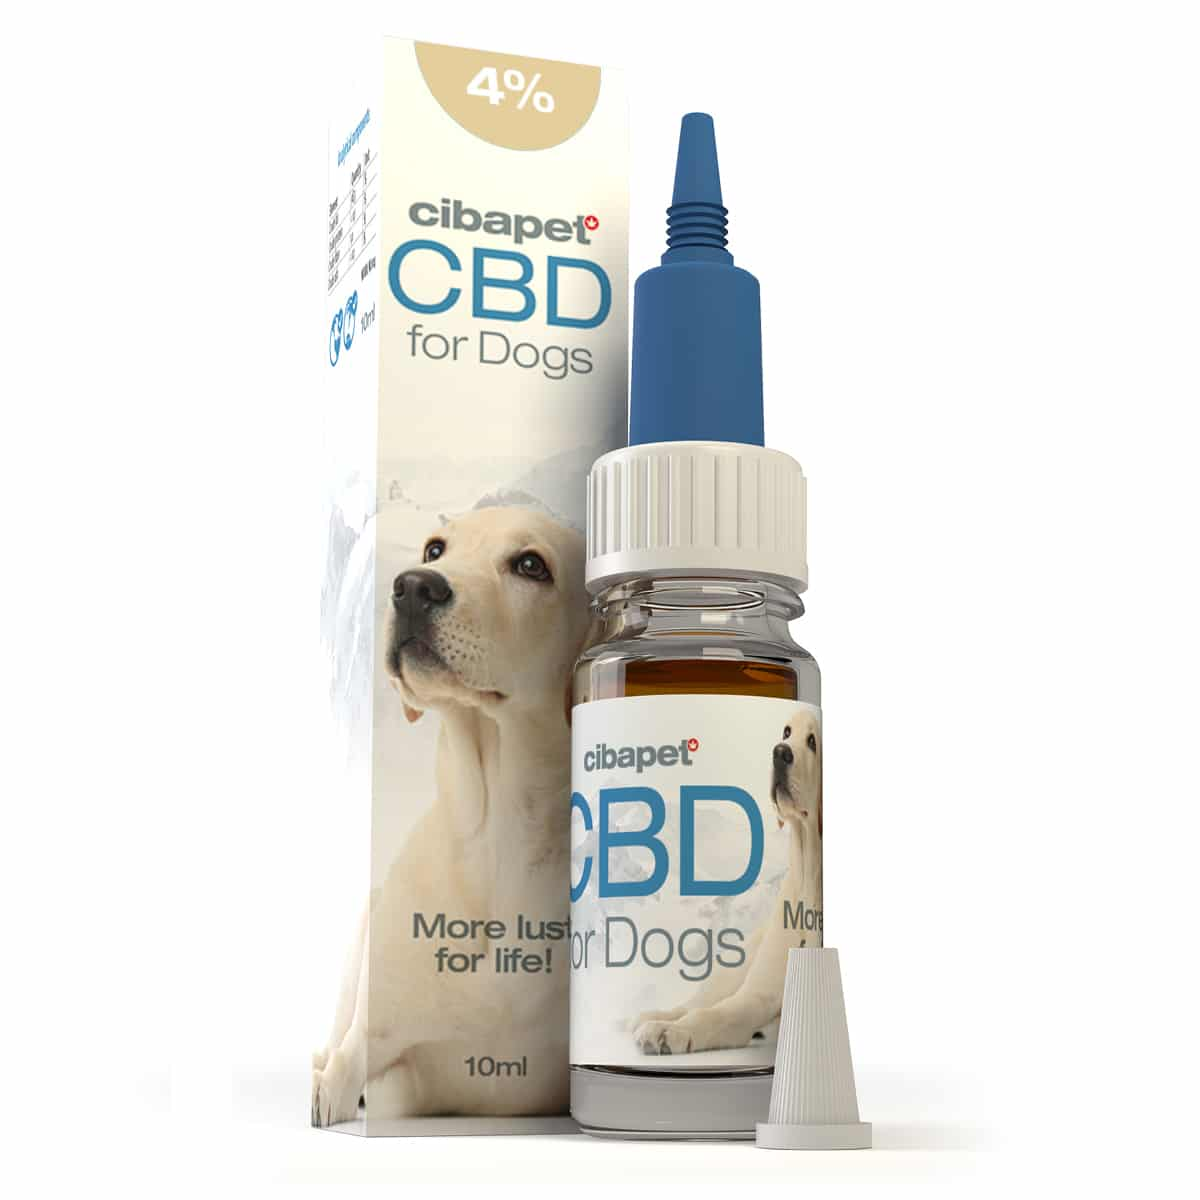 Cibapet CBD Oil for Cats & Dogs